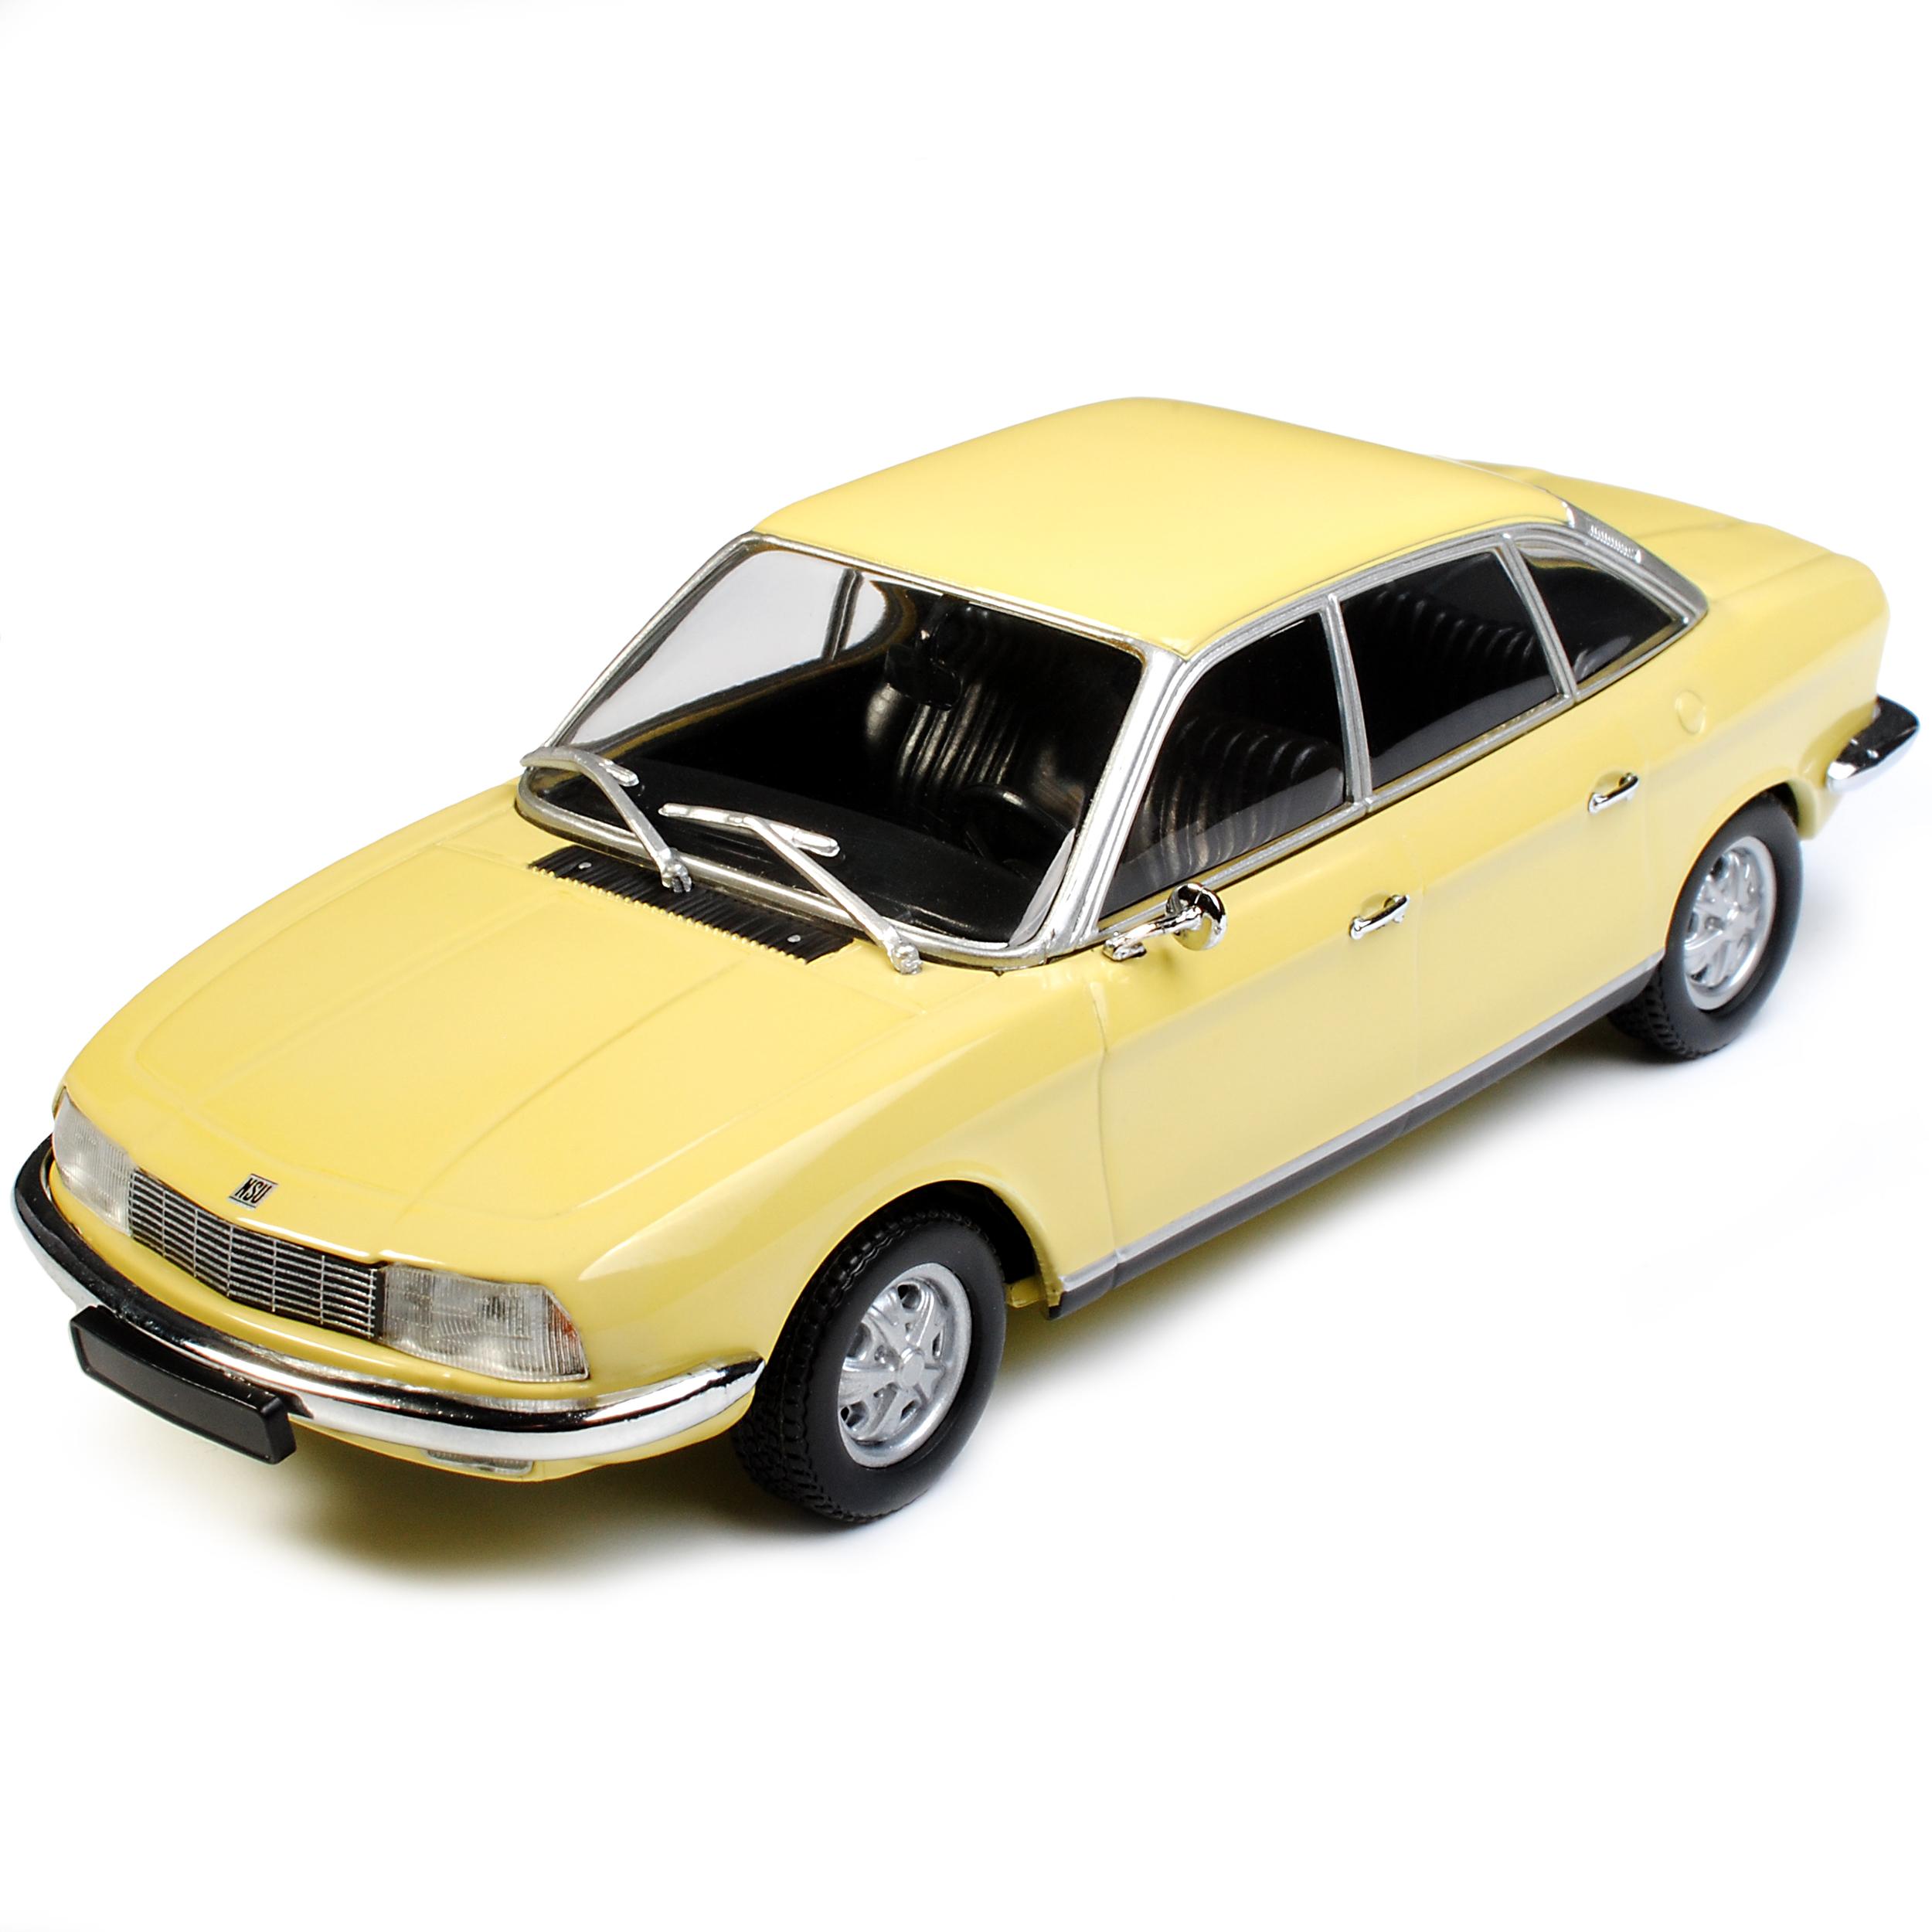 NSU RO80 Limousine Cgoldna yellow 1967-1977 1967-1977 1967-1977 1 43 Minichamps Maxichamps Modell Aut.. db8b86